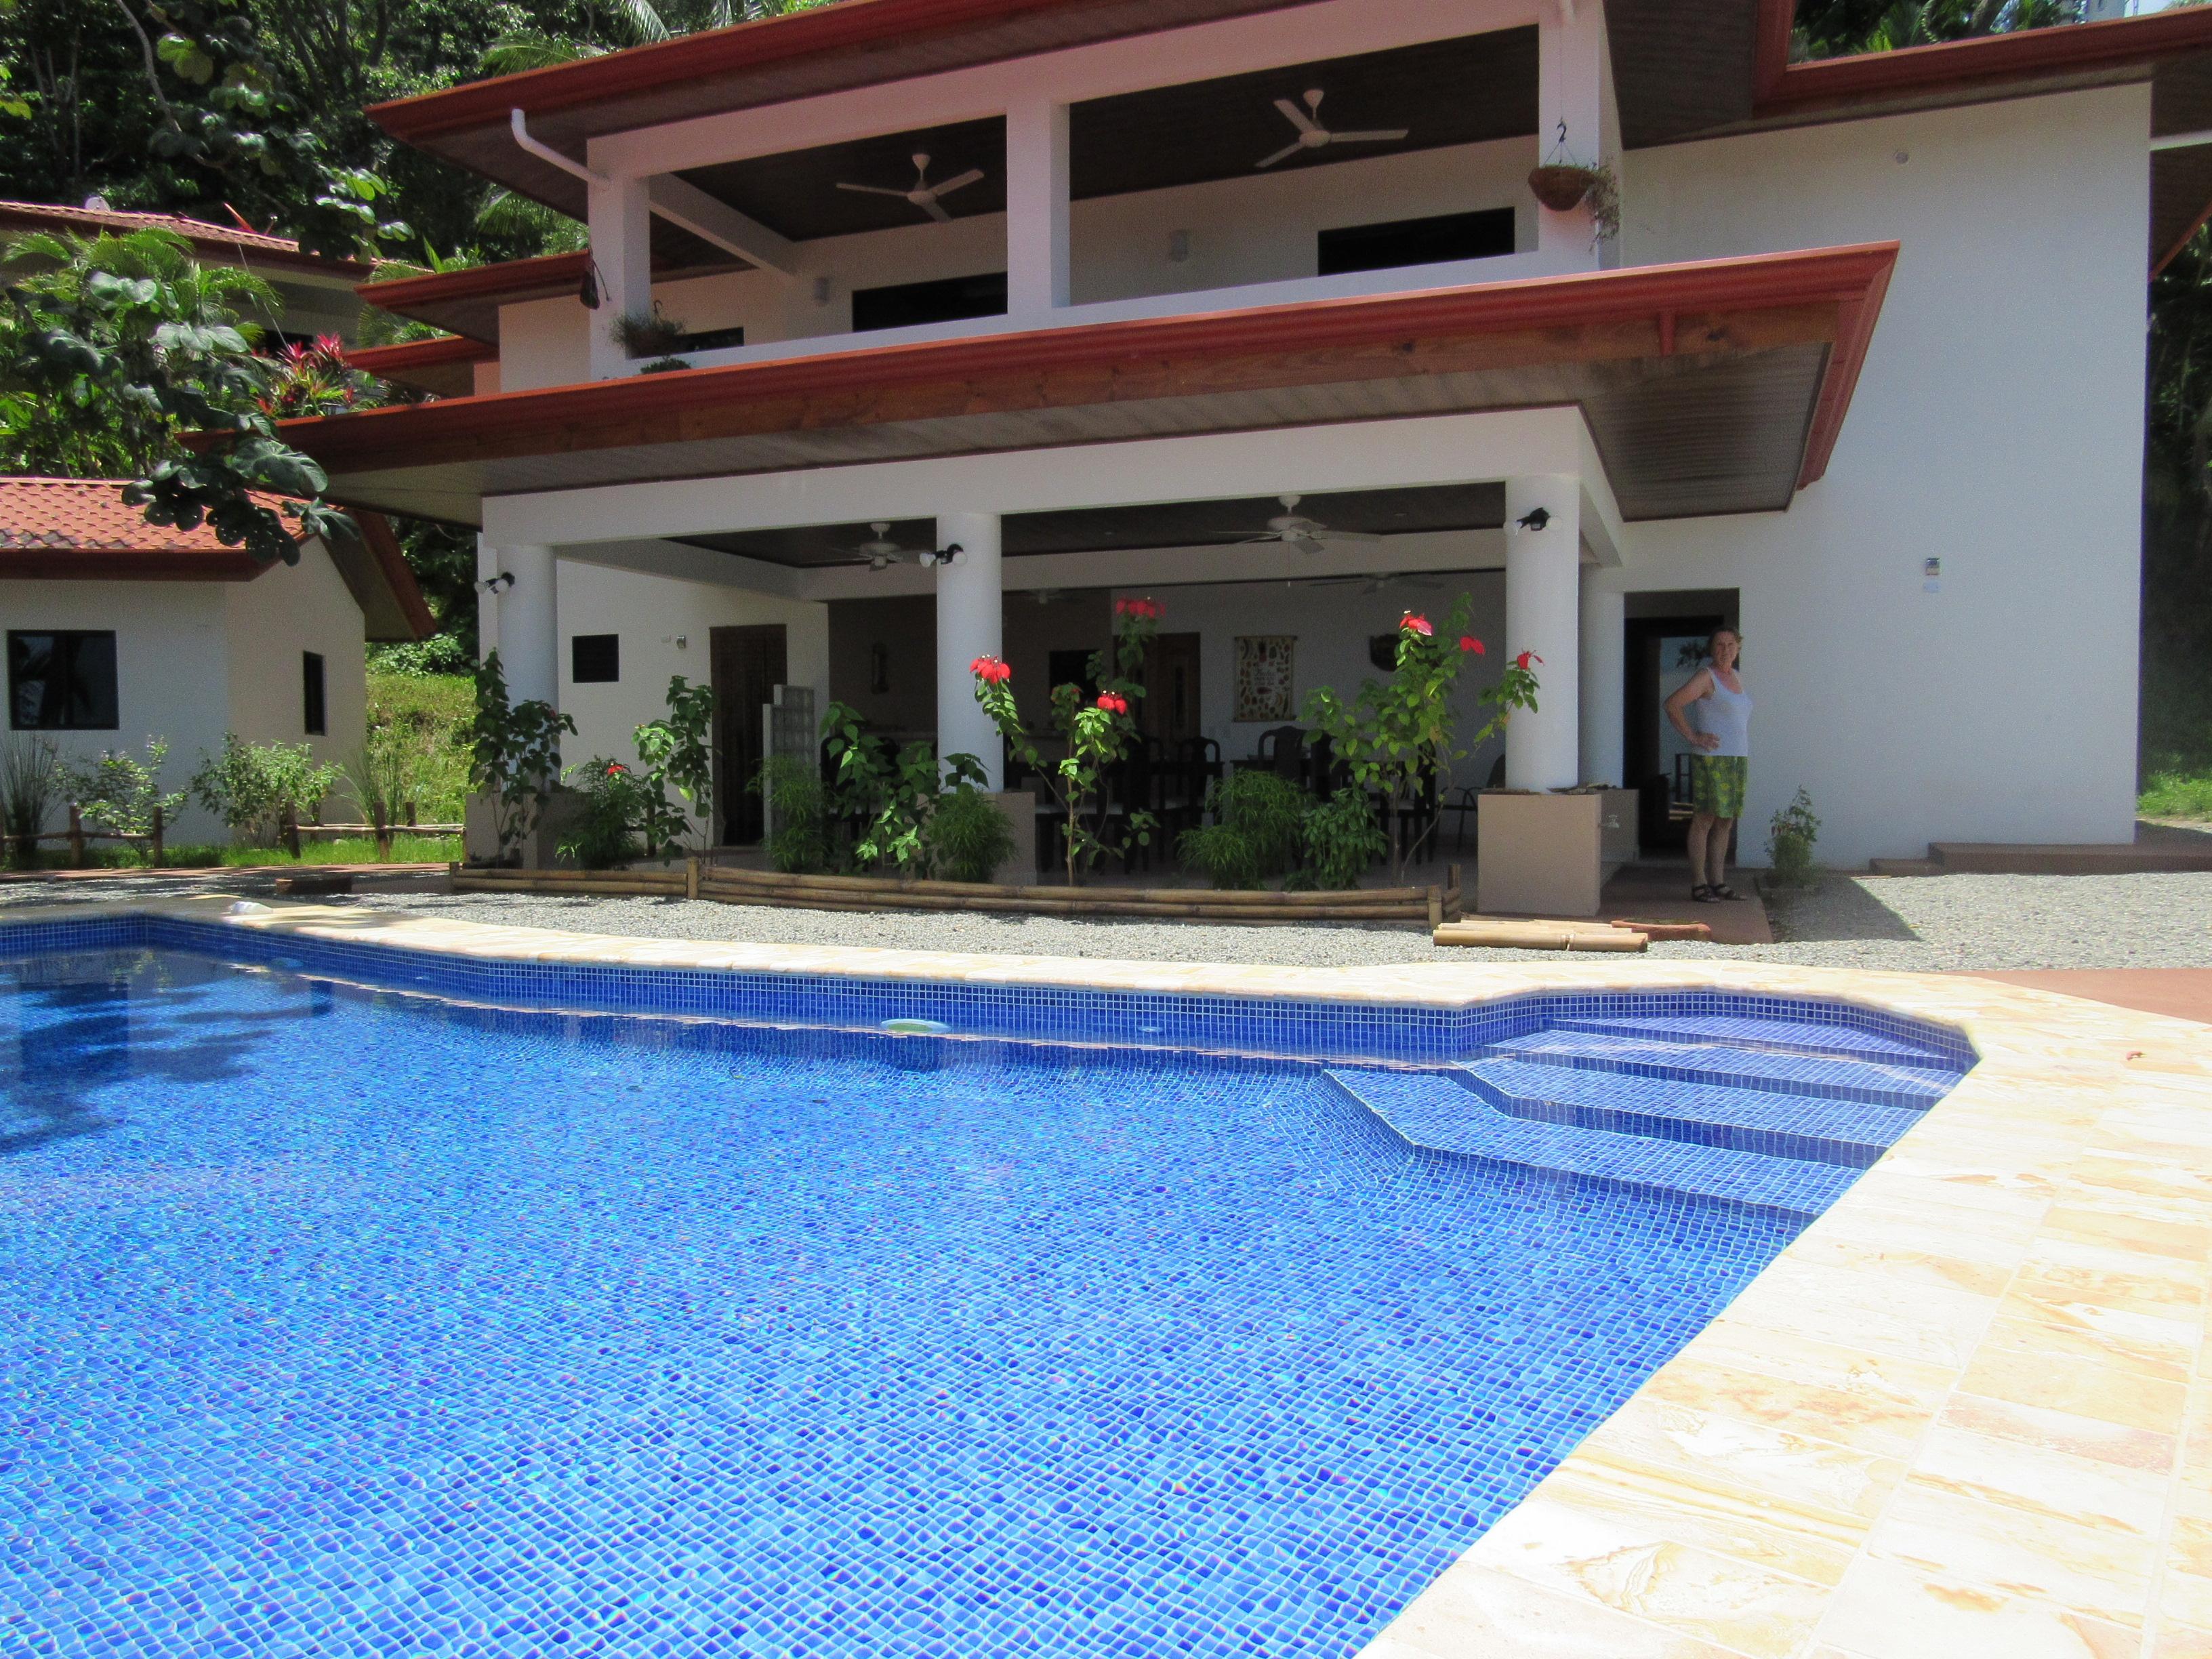 Hatillo-Costa-Rica-property-costaricarealestateHAT087-1.jpg